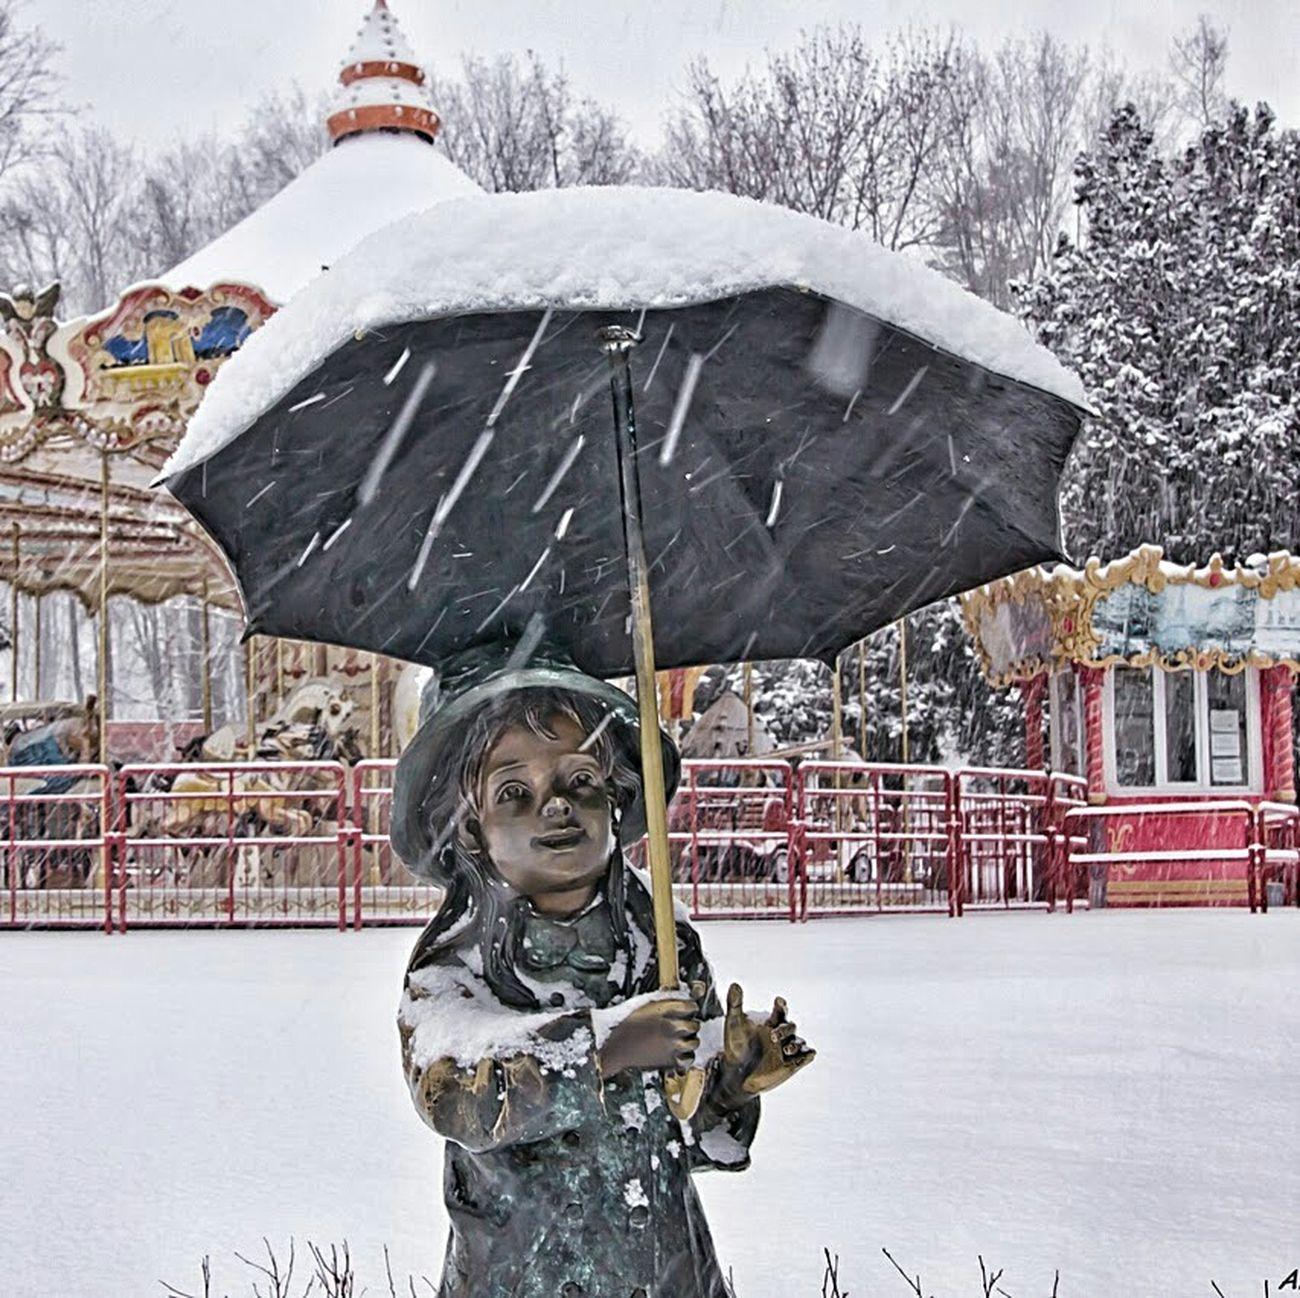 скульптура снег Природа Харьков зима январь парк Winter Taking Photos That's Me